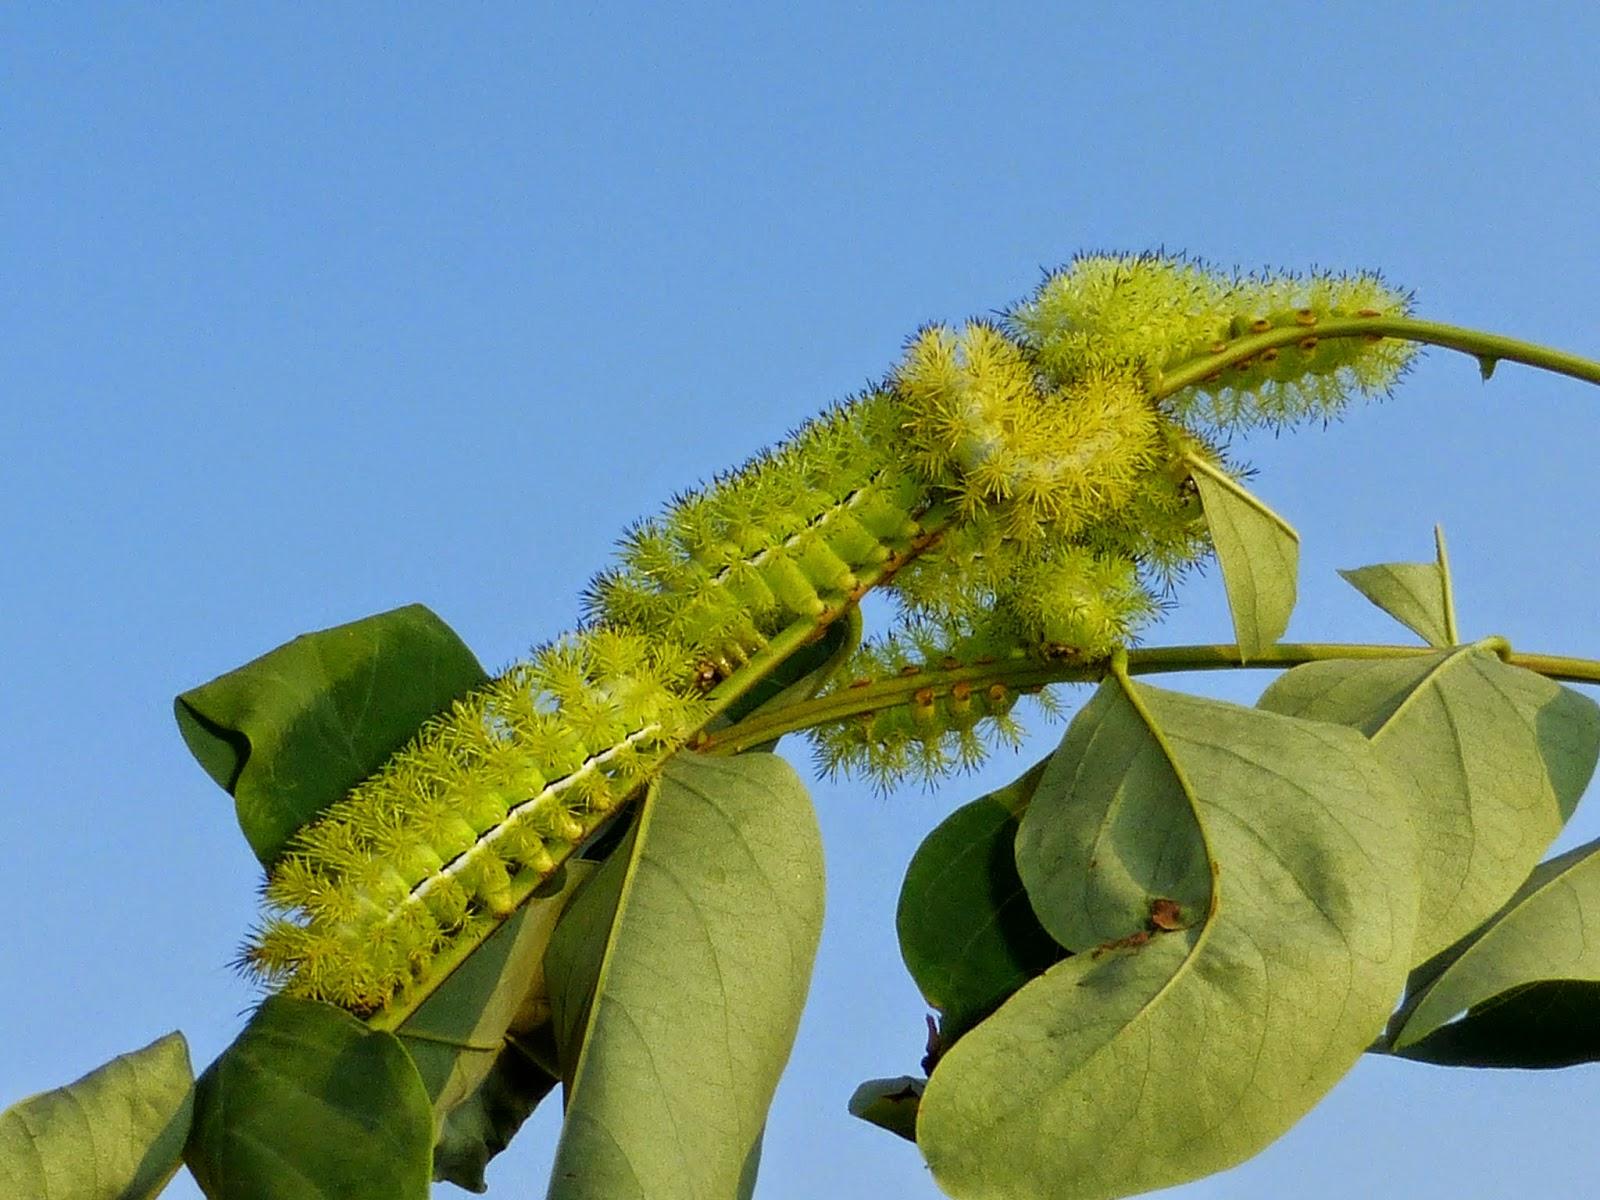 Automeris iris caterpillar